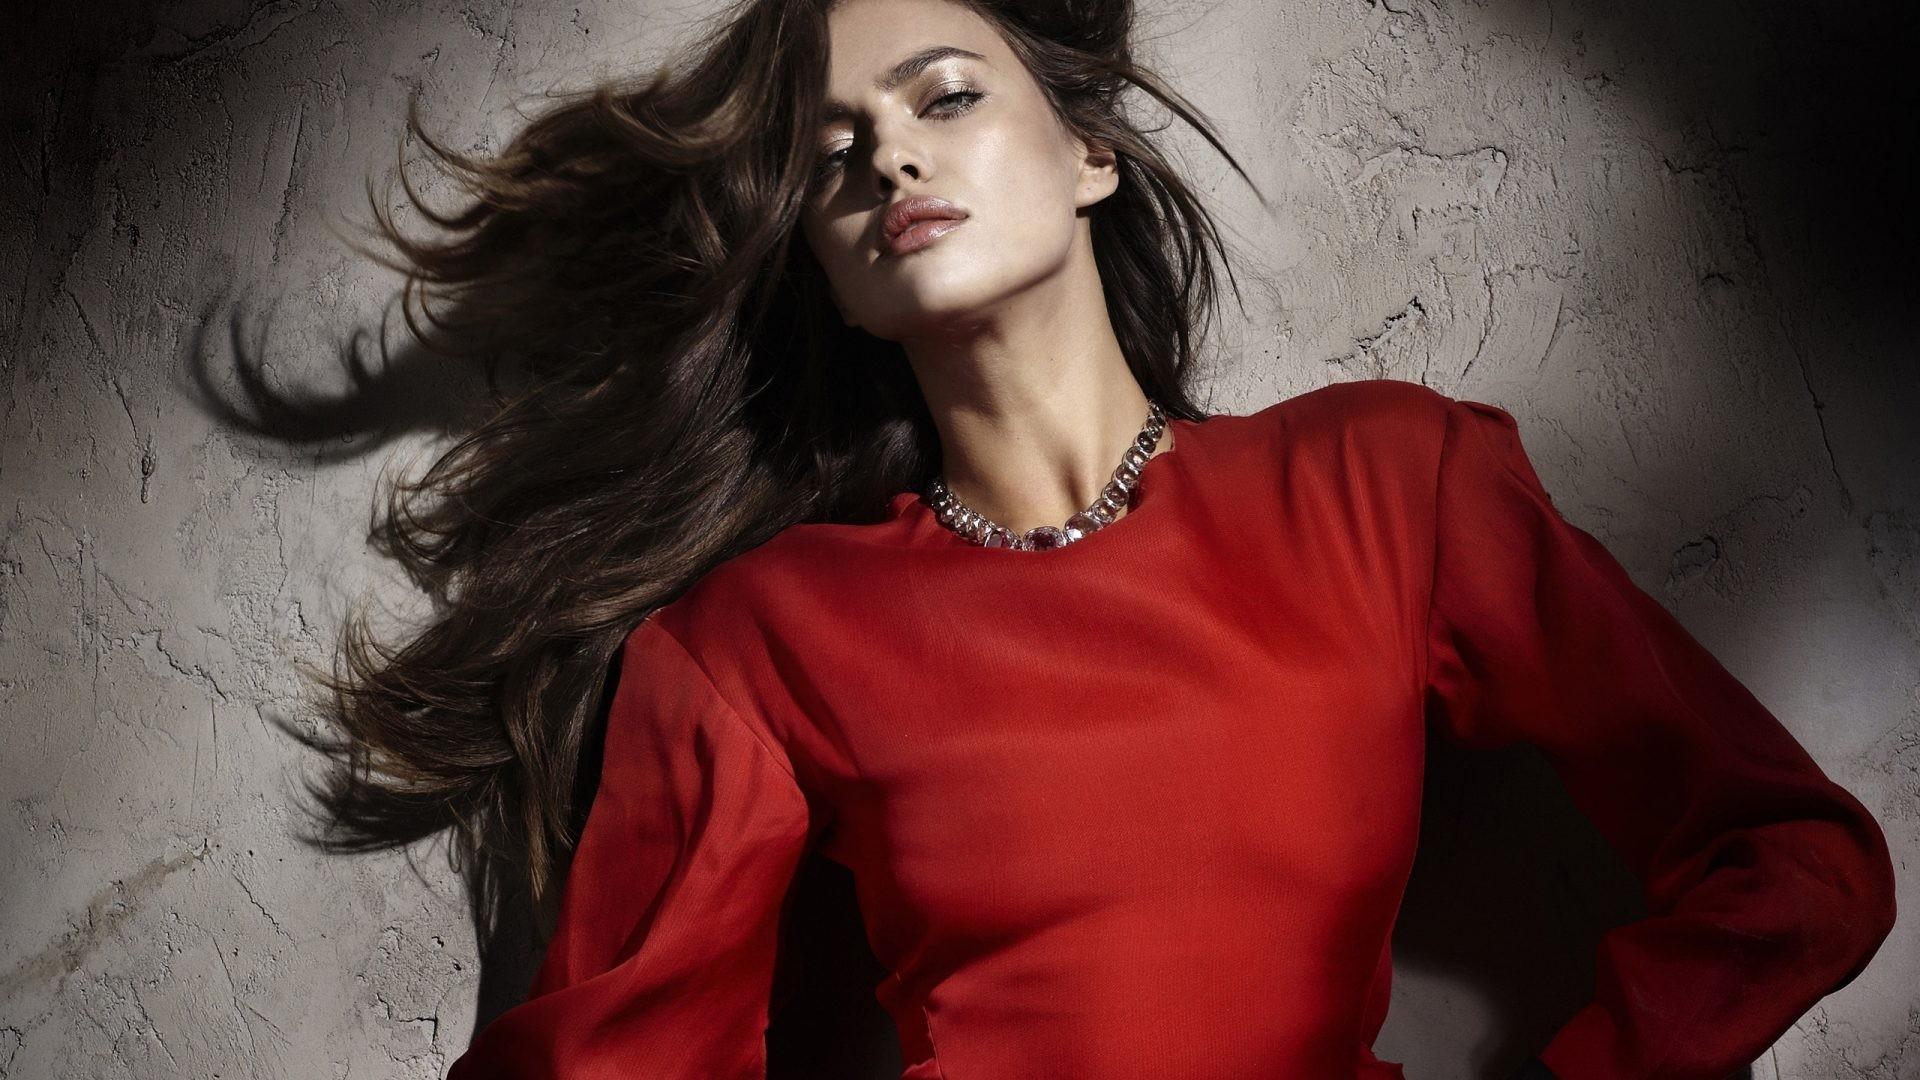 Runway Fashion: International Diva, - Online, Play Free at 51